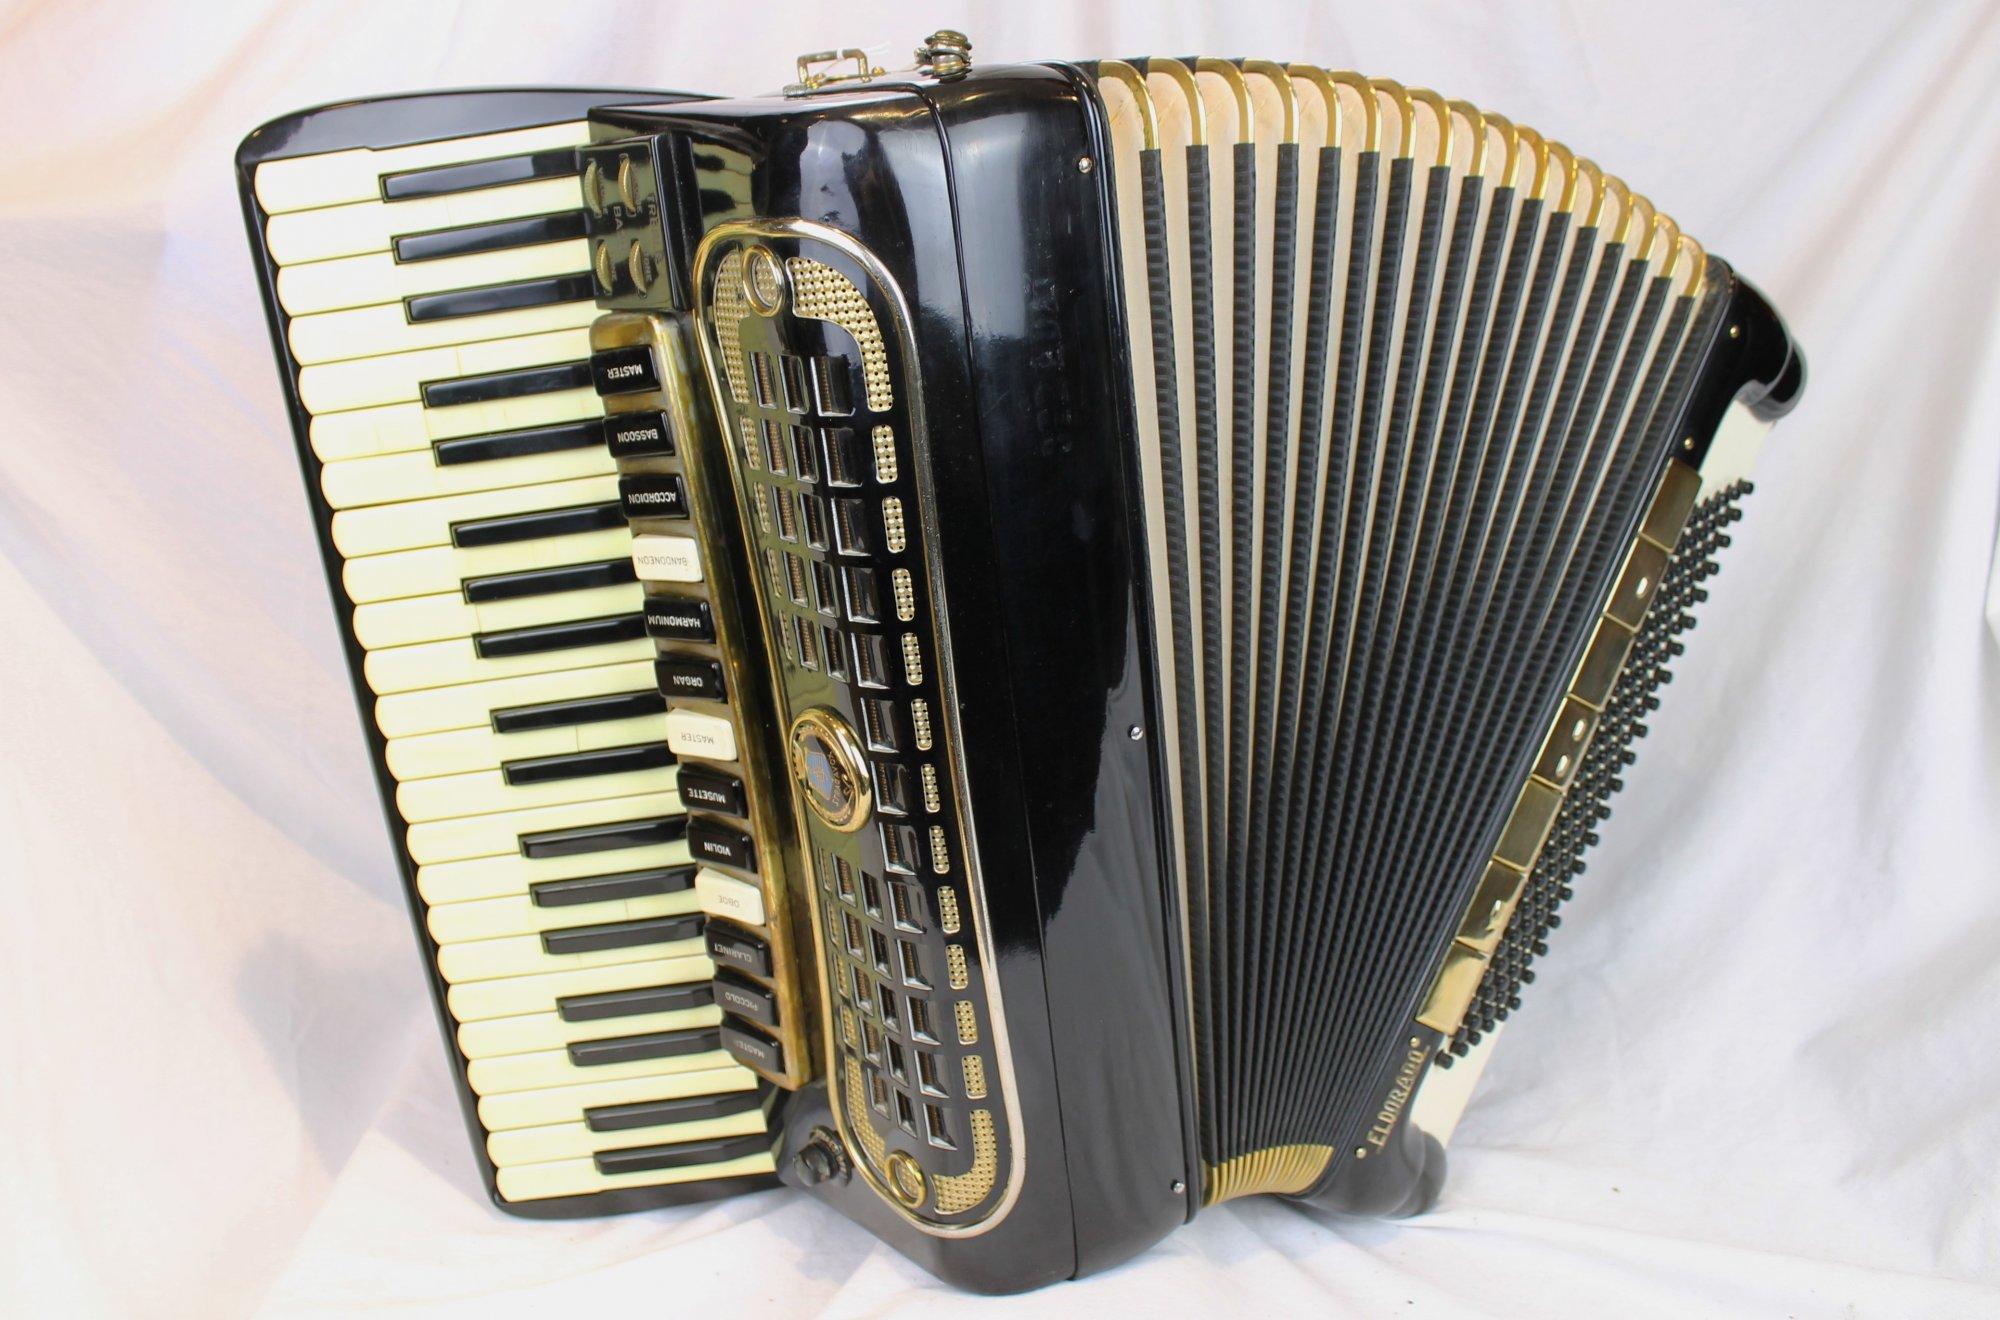 4226 - Black Stradavox Quadruple Tone Chamber Piano Accordion LMMH 41 120